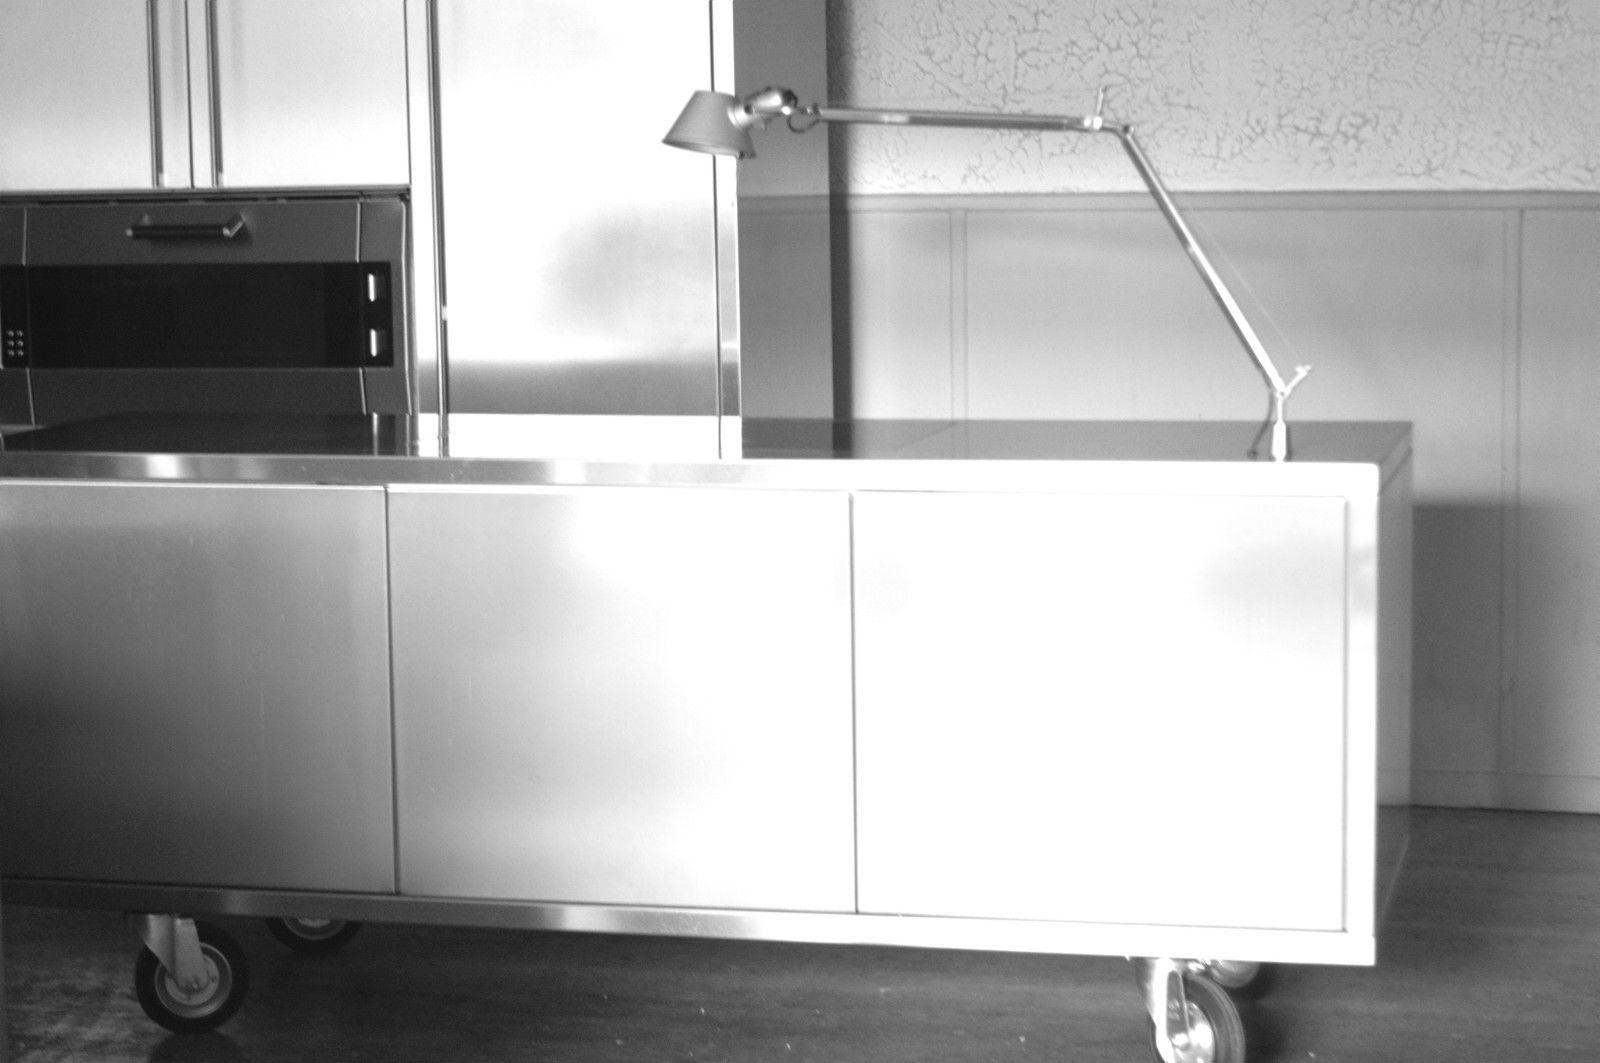 k chenmodule bulthaup system 20 edelstahl gaggenau. Black Bedroom Furniture Sets. Home Design Ideas